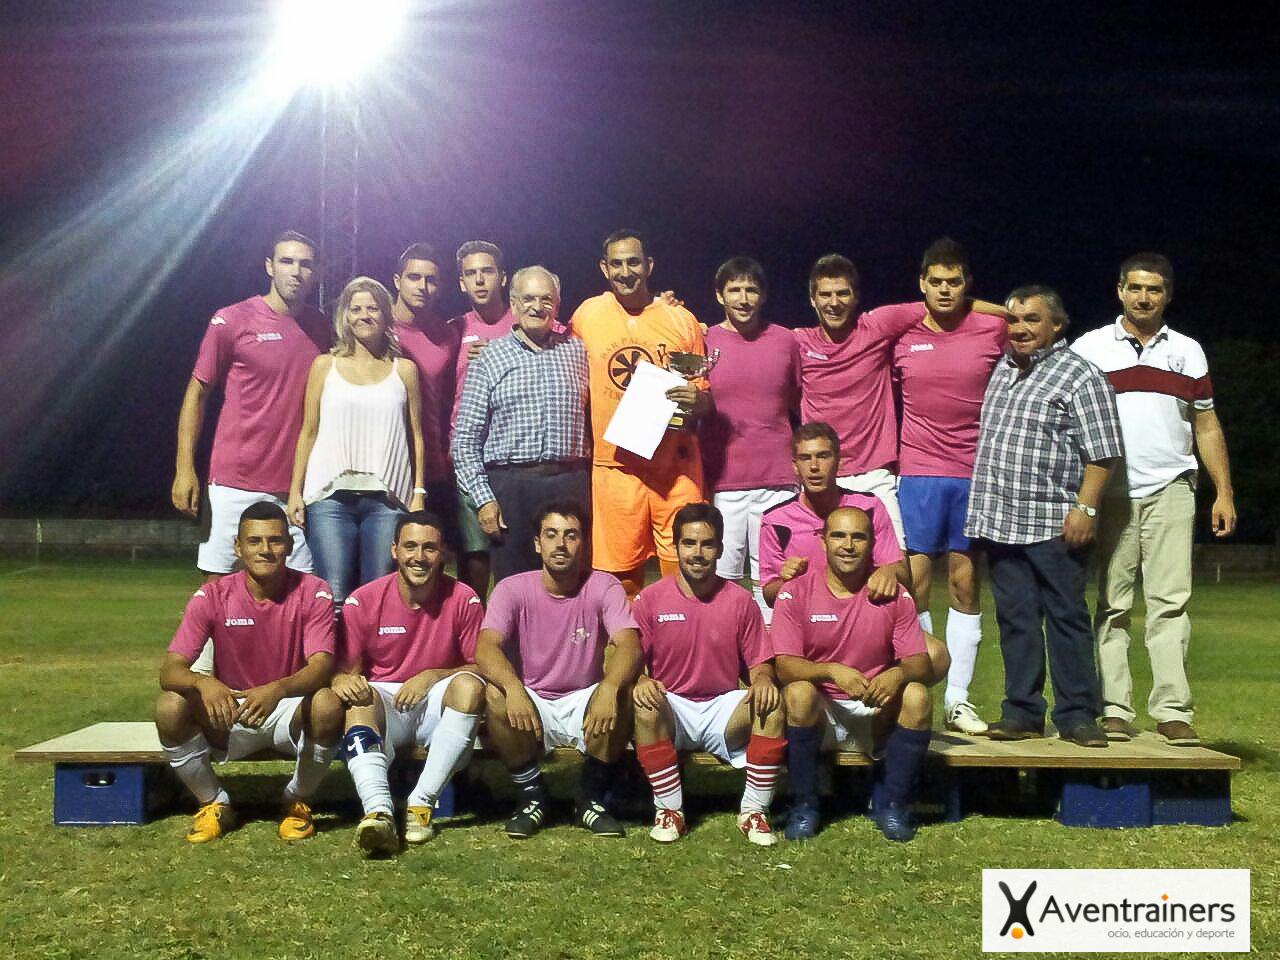 TROFEO FUTBOL CABEZUELA